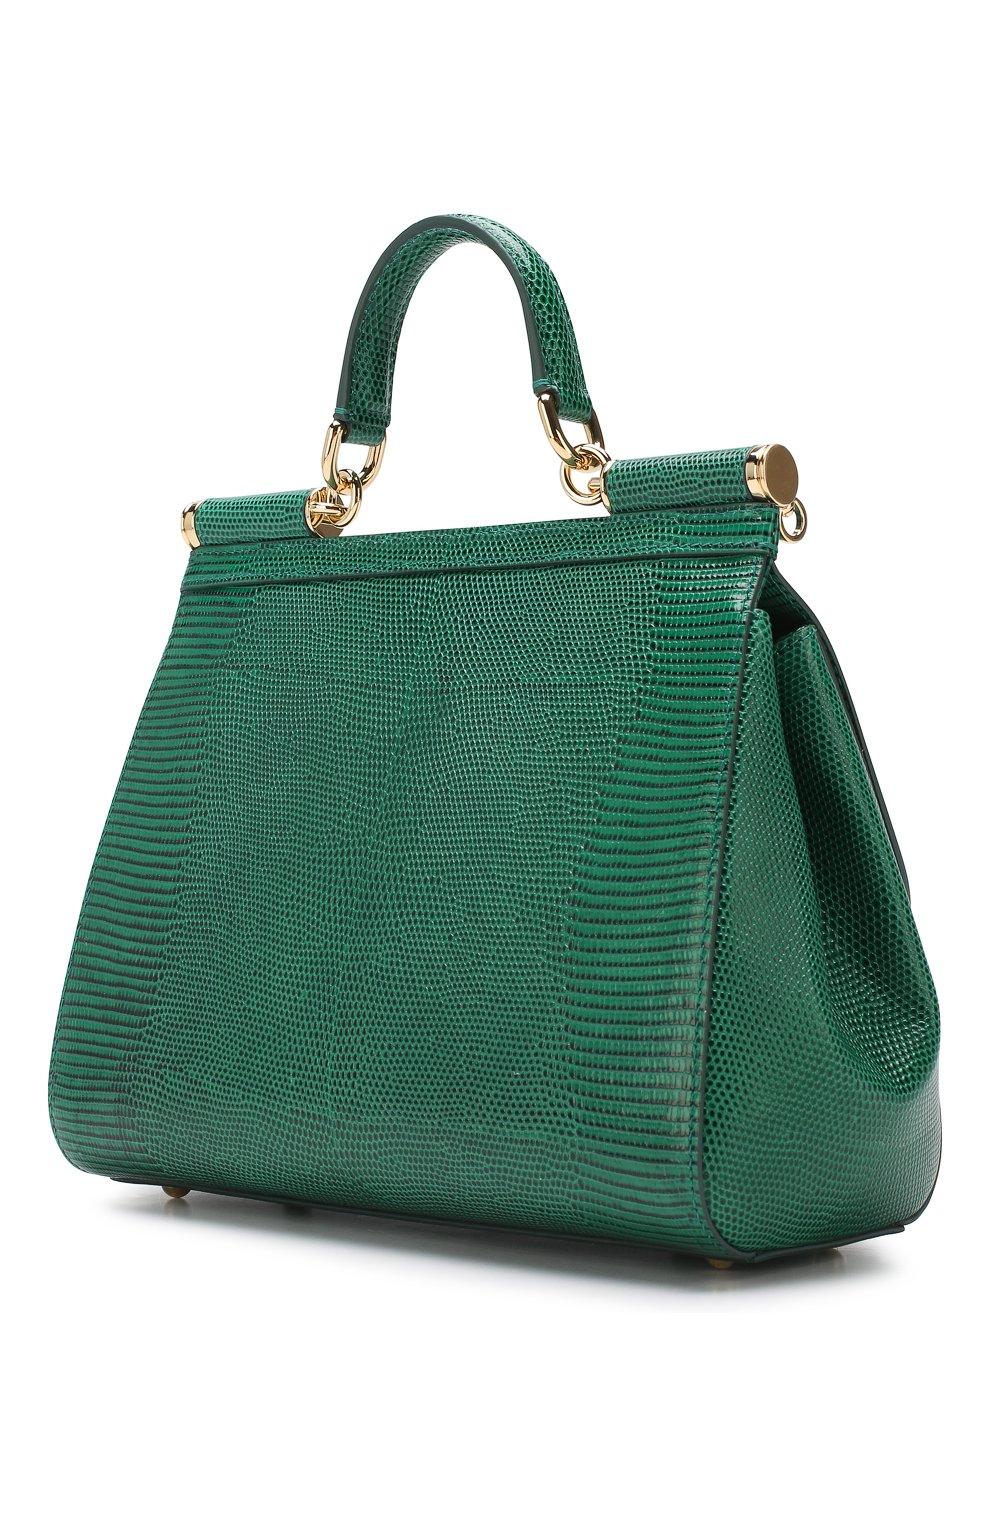 1add1fa43da4 Сумки Dolce   Gabbana по цене от 21 600 руб. купить в интернет-магазине ЦУМ